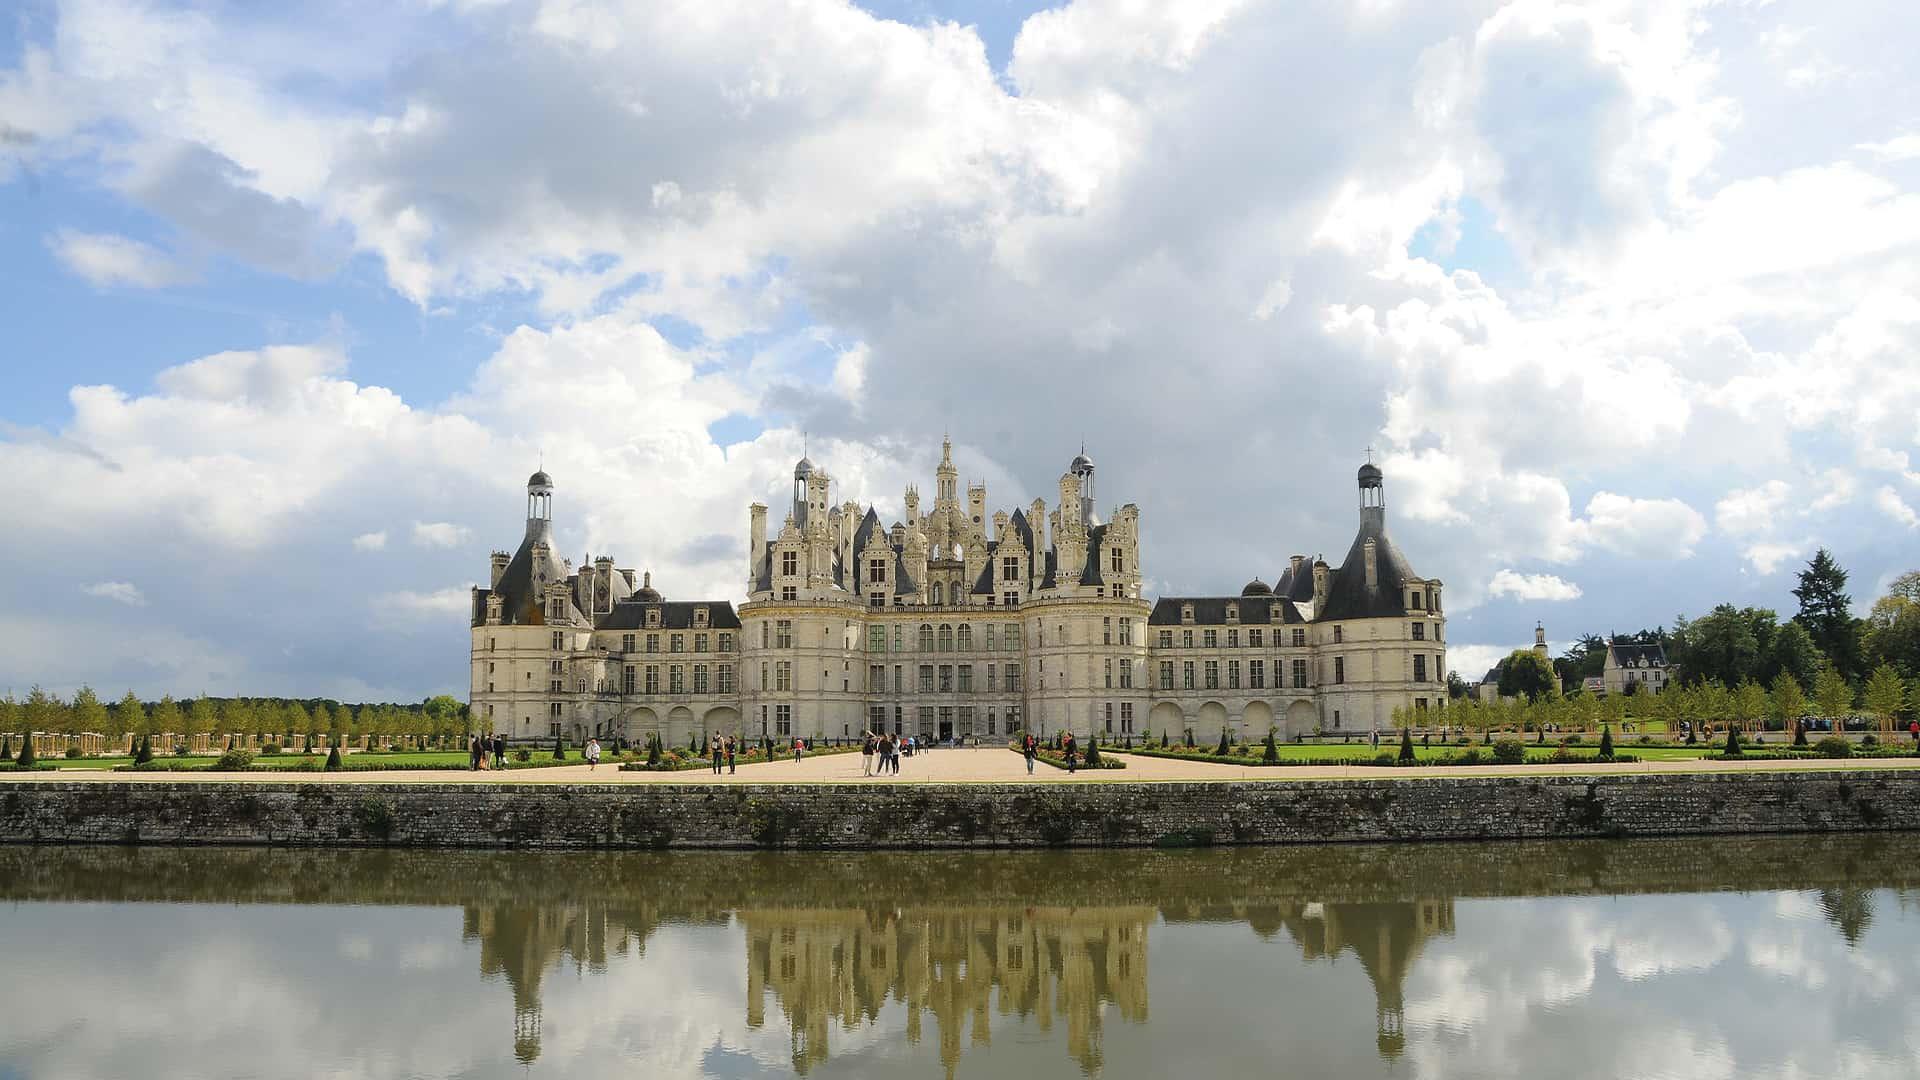 Best of Western France